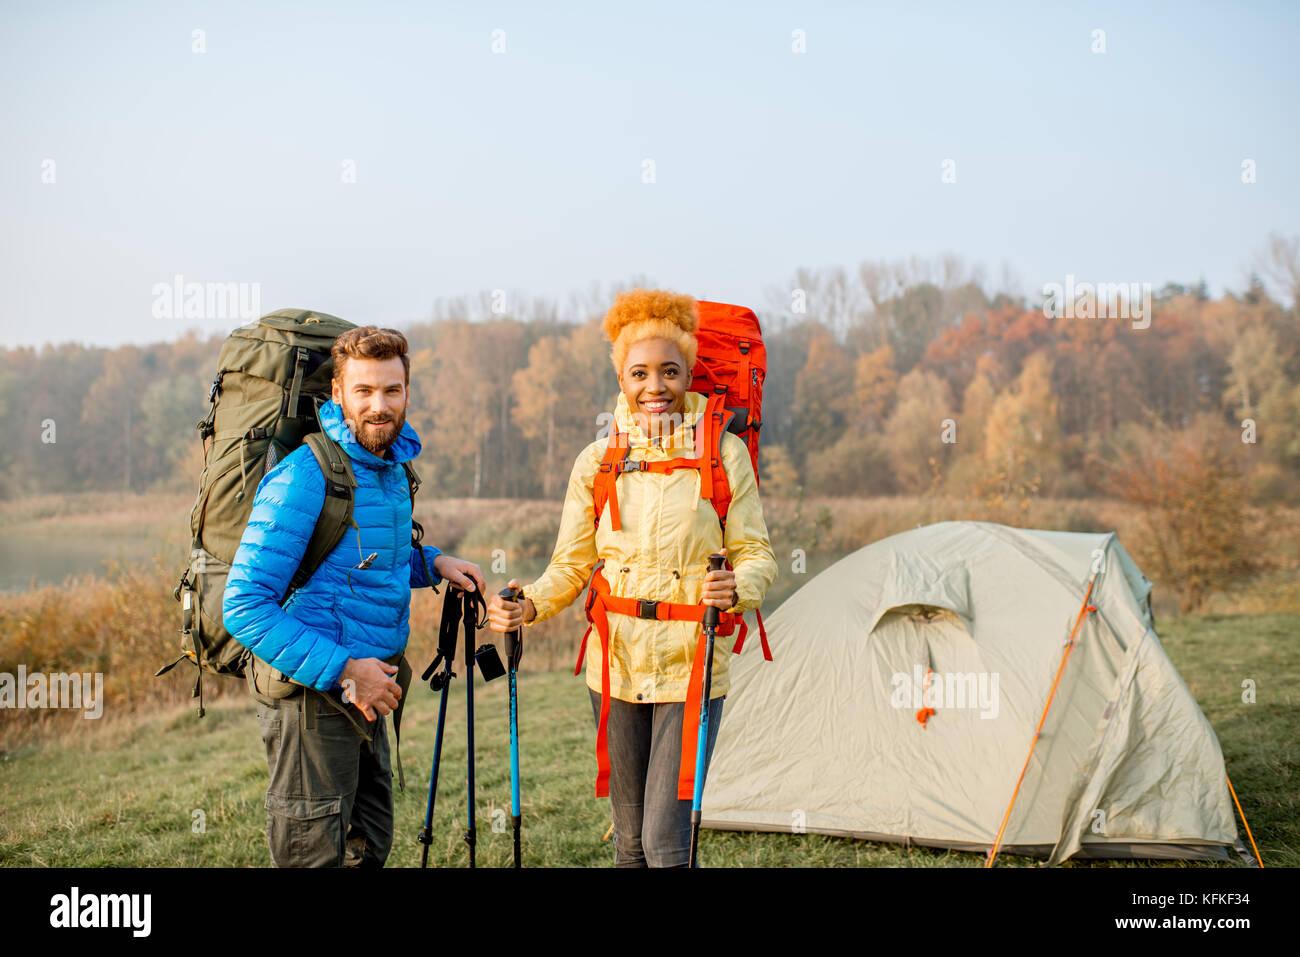 Couple hiking with backpacks - Stock Image